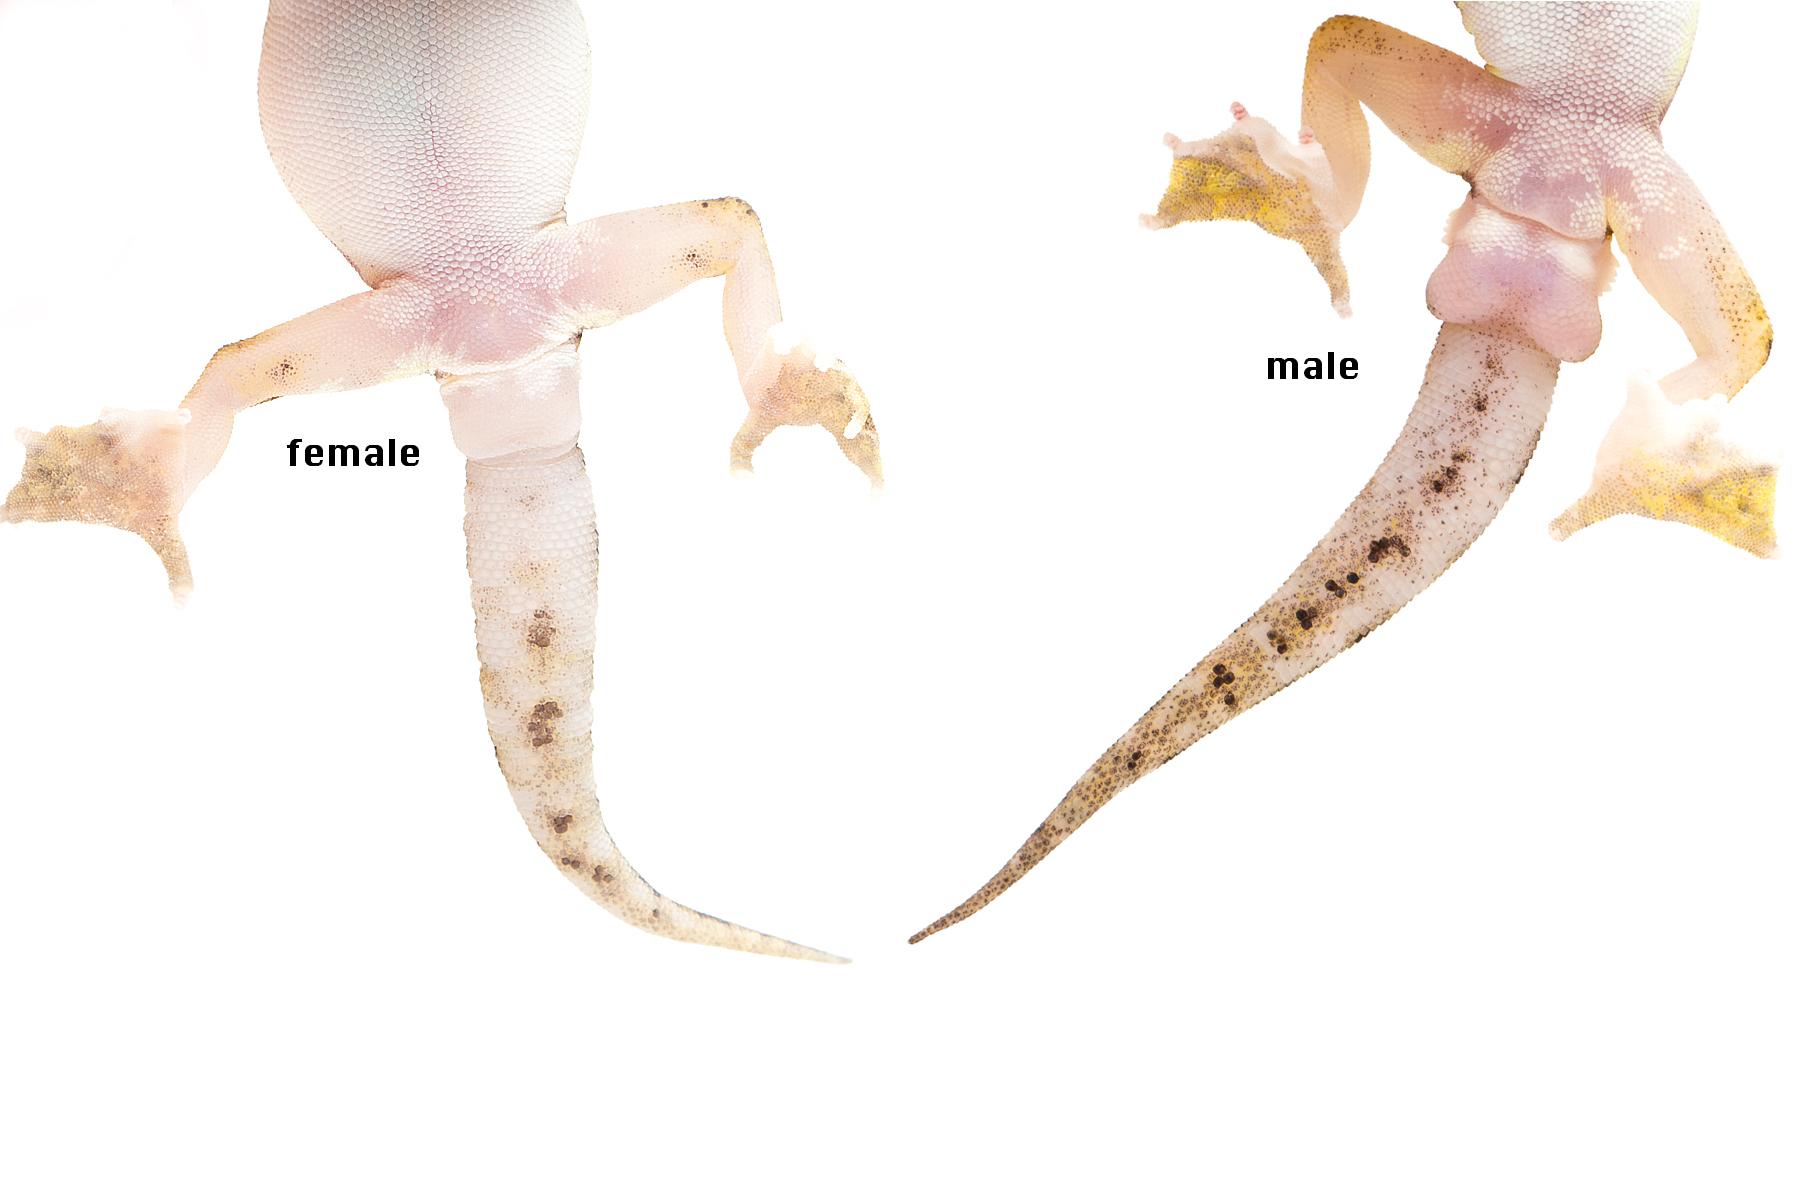 Female vs. male